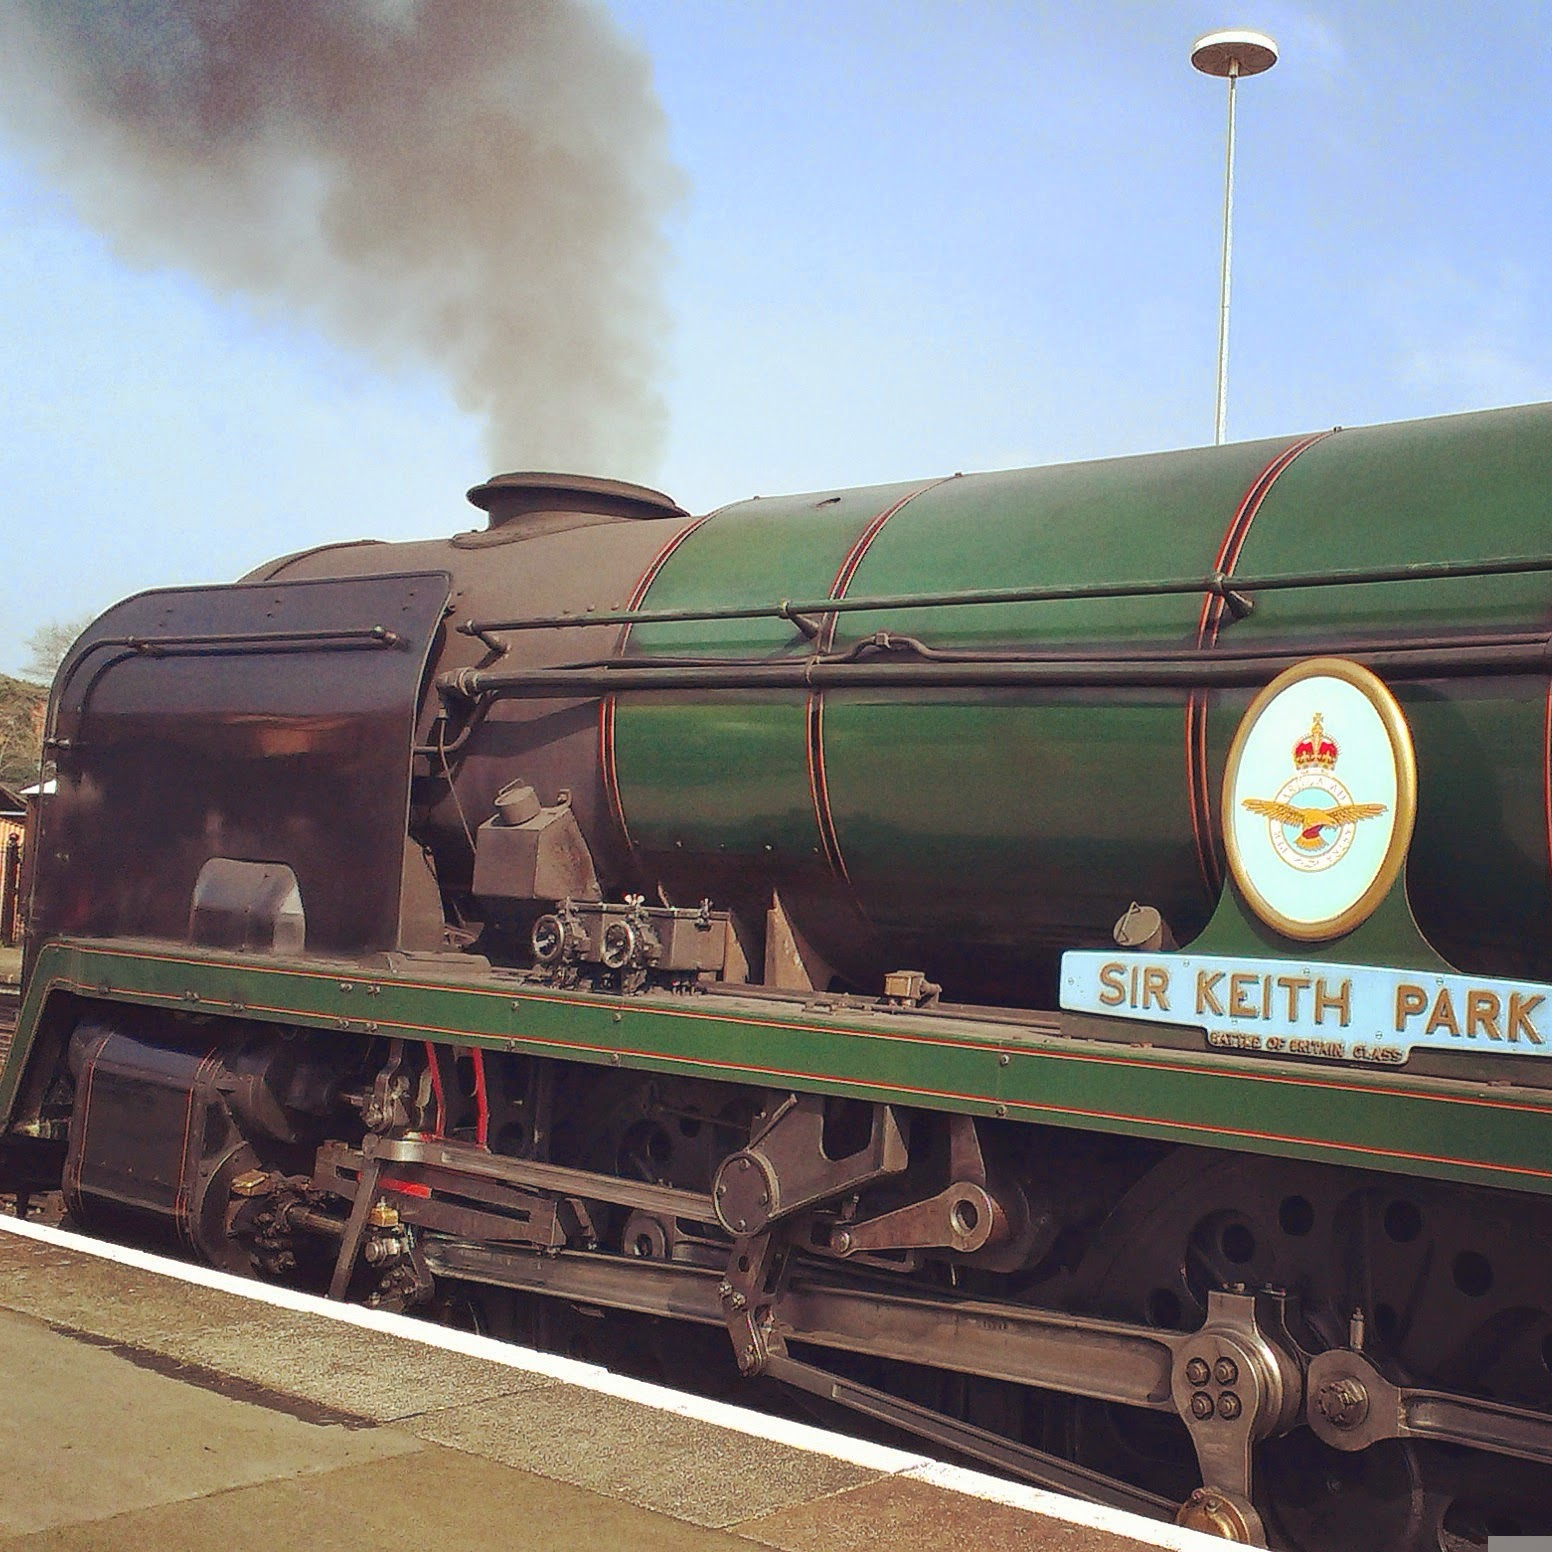 Sir Keith Park railway engine on Severn Valley Railway